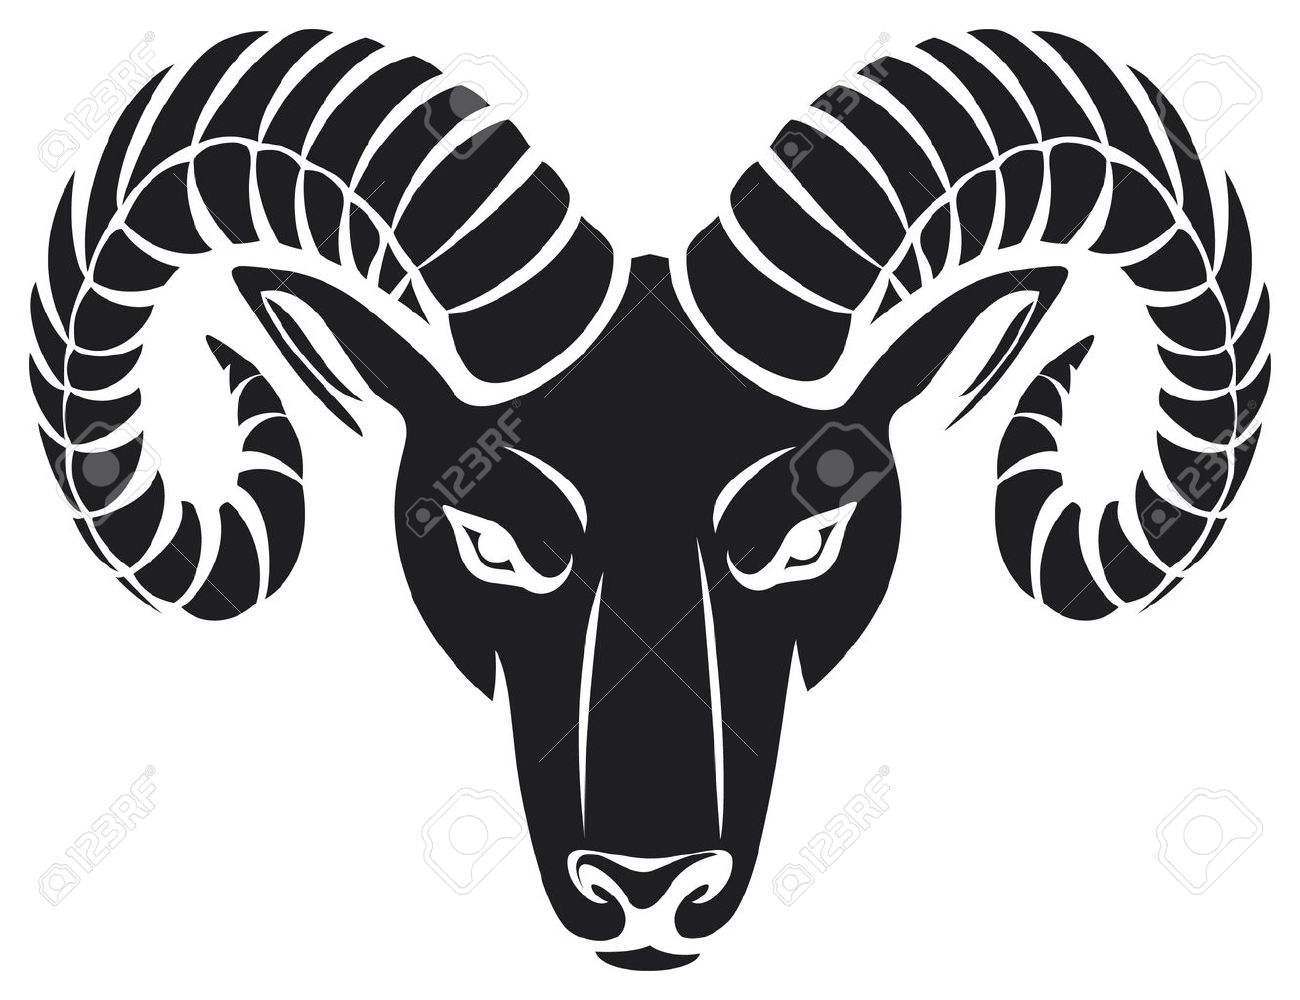 head of the ram (ram head) - 15970757